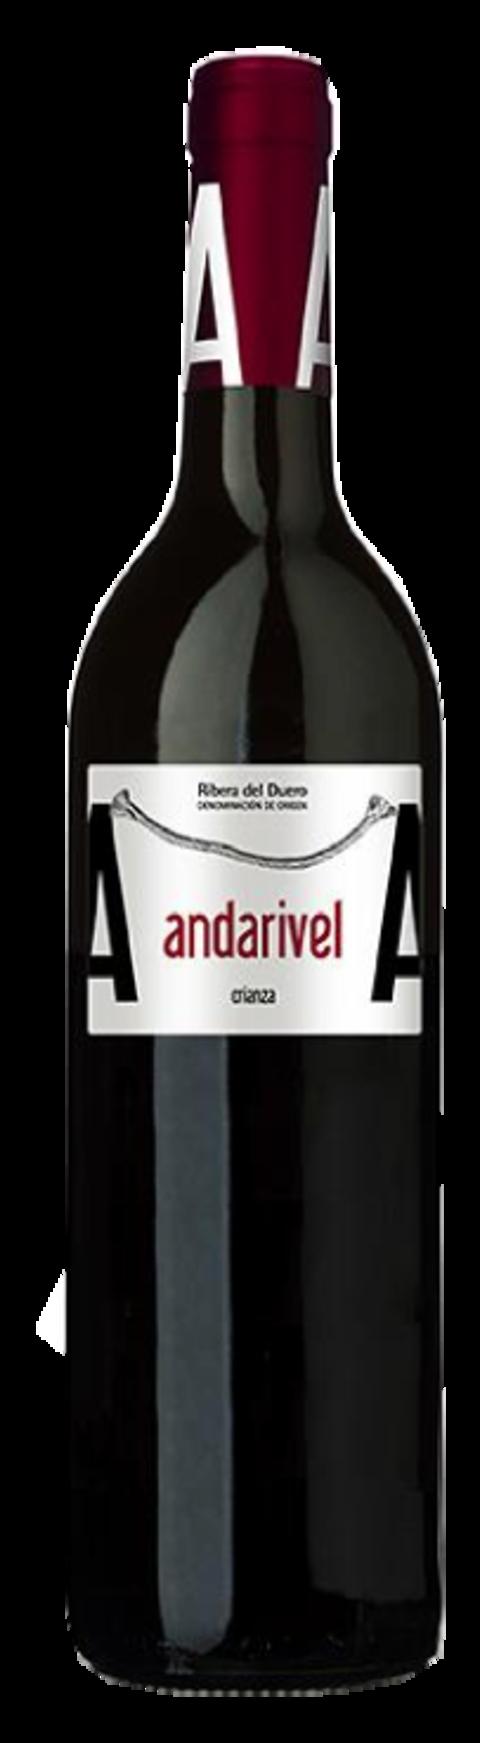 Bodegas Orvi - ANDARIVEL CRIANZA - Bodegas Orvi